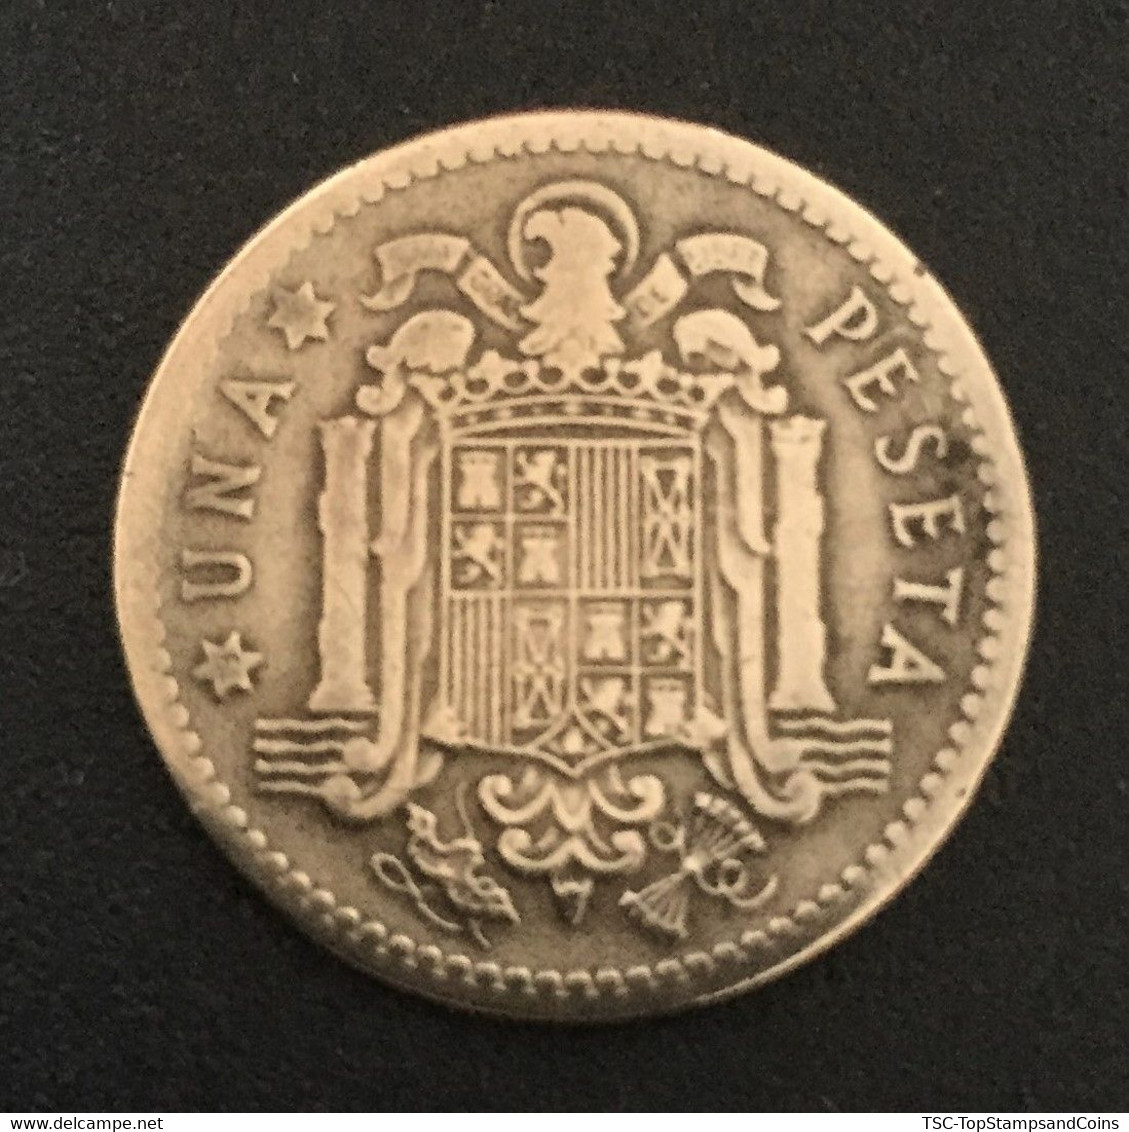 $$ESP1000-Francisco Franco - 1 Peseta Coin - Spain - 1953 - 1 Peseta